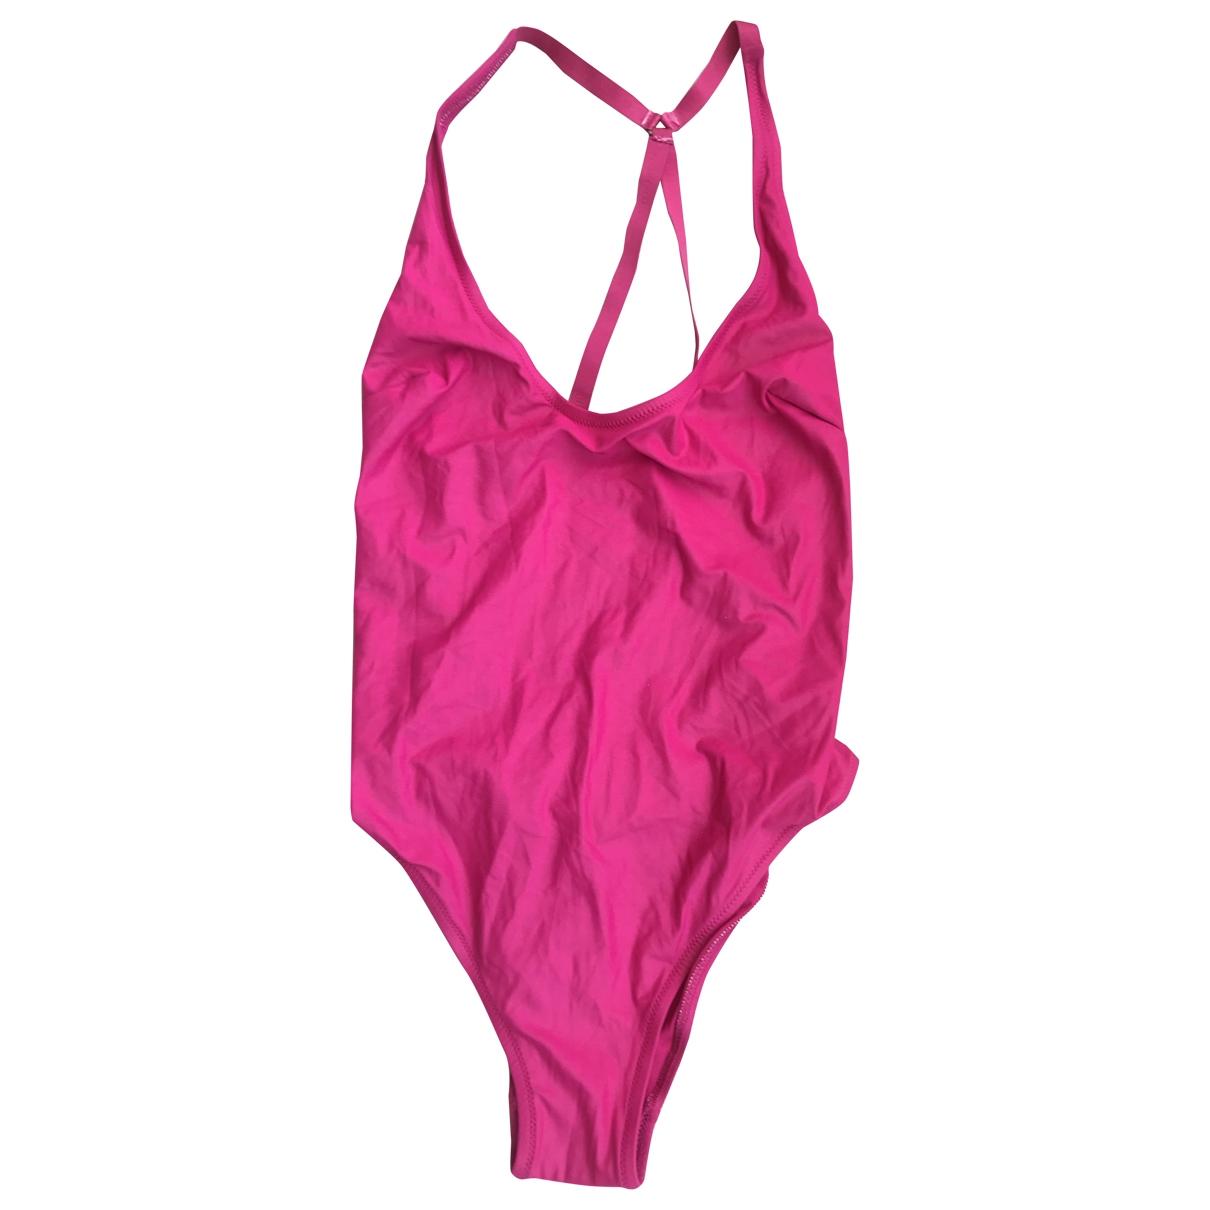 Gianfranco Ferre - Bain   pour femme en coton - elasthane - rose